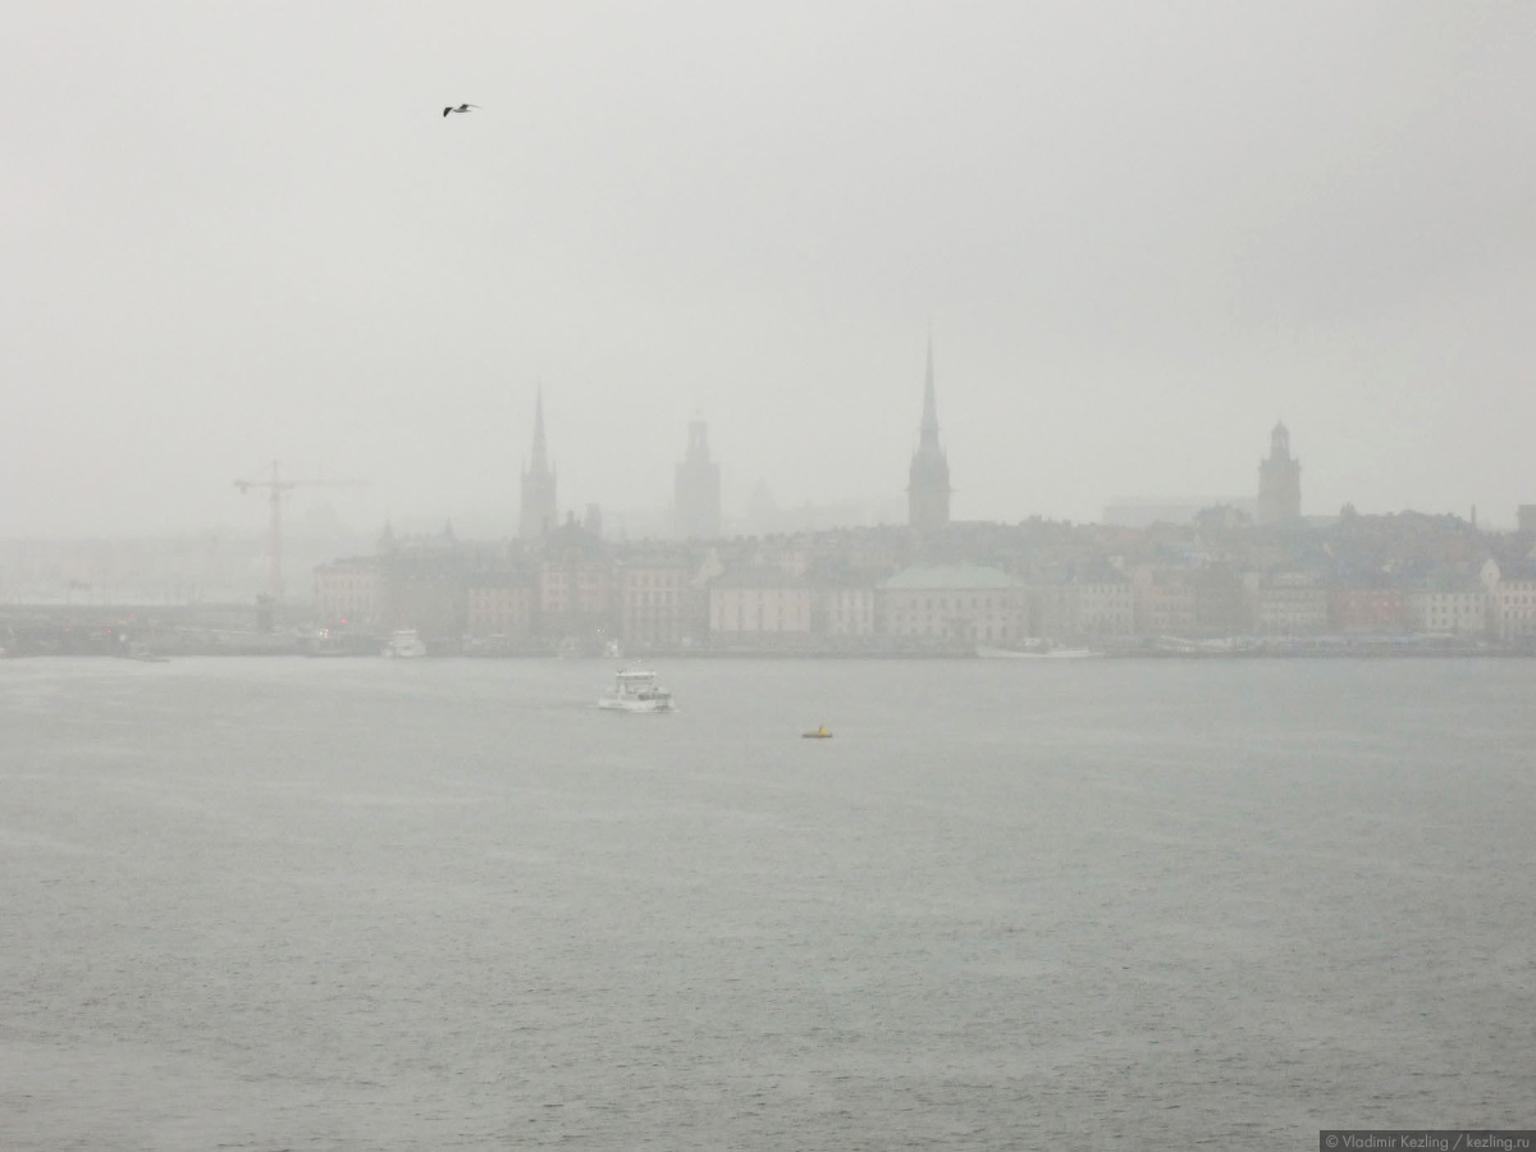 Балтийские берега. Стокгольм. Взгляды с воды